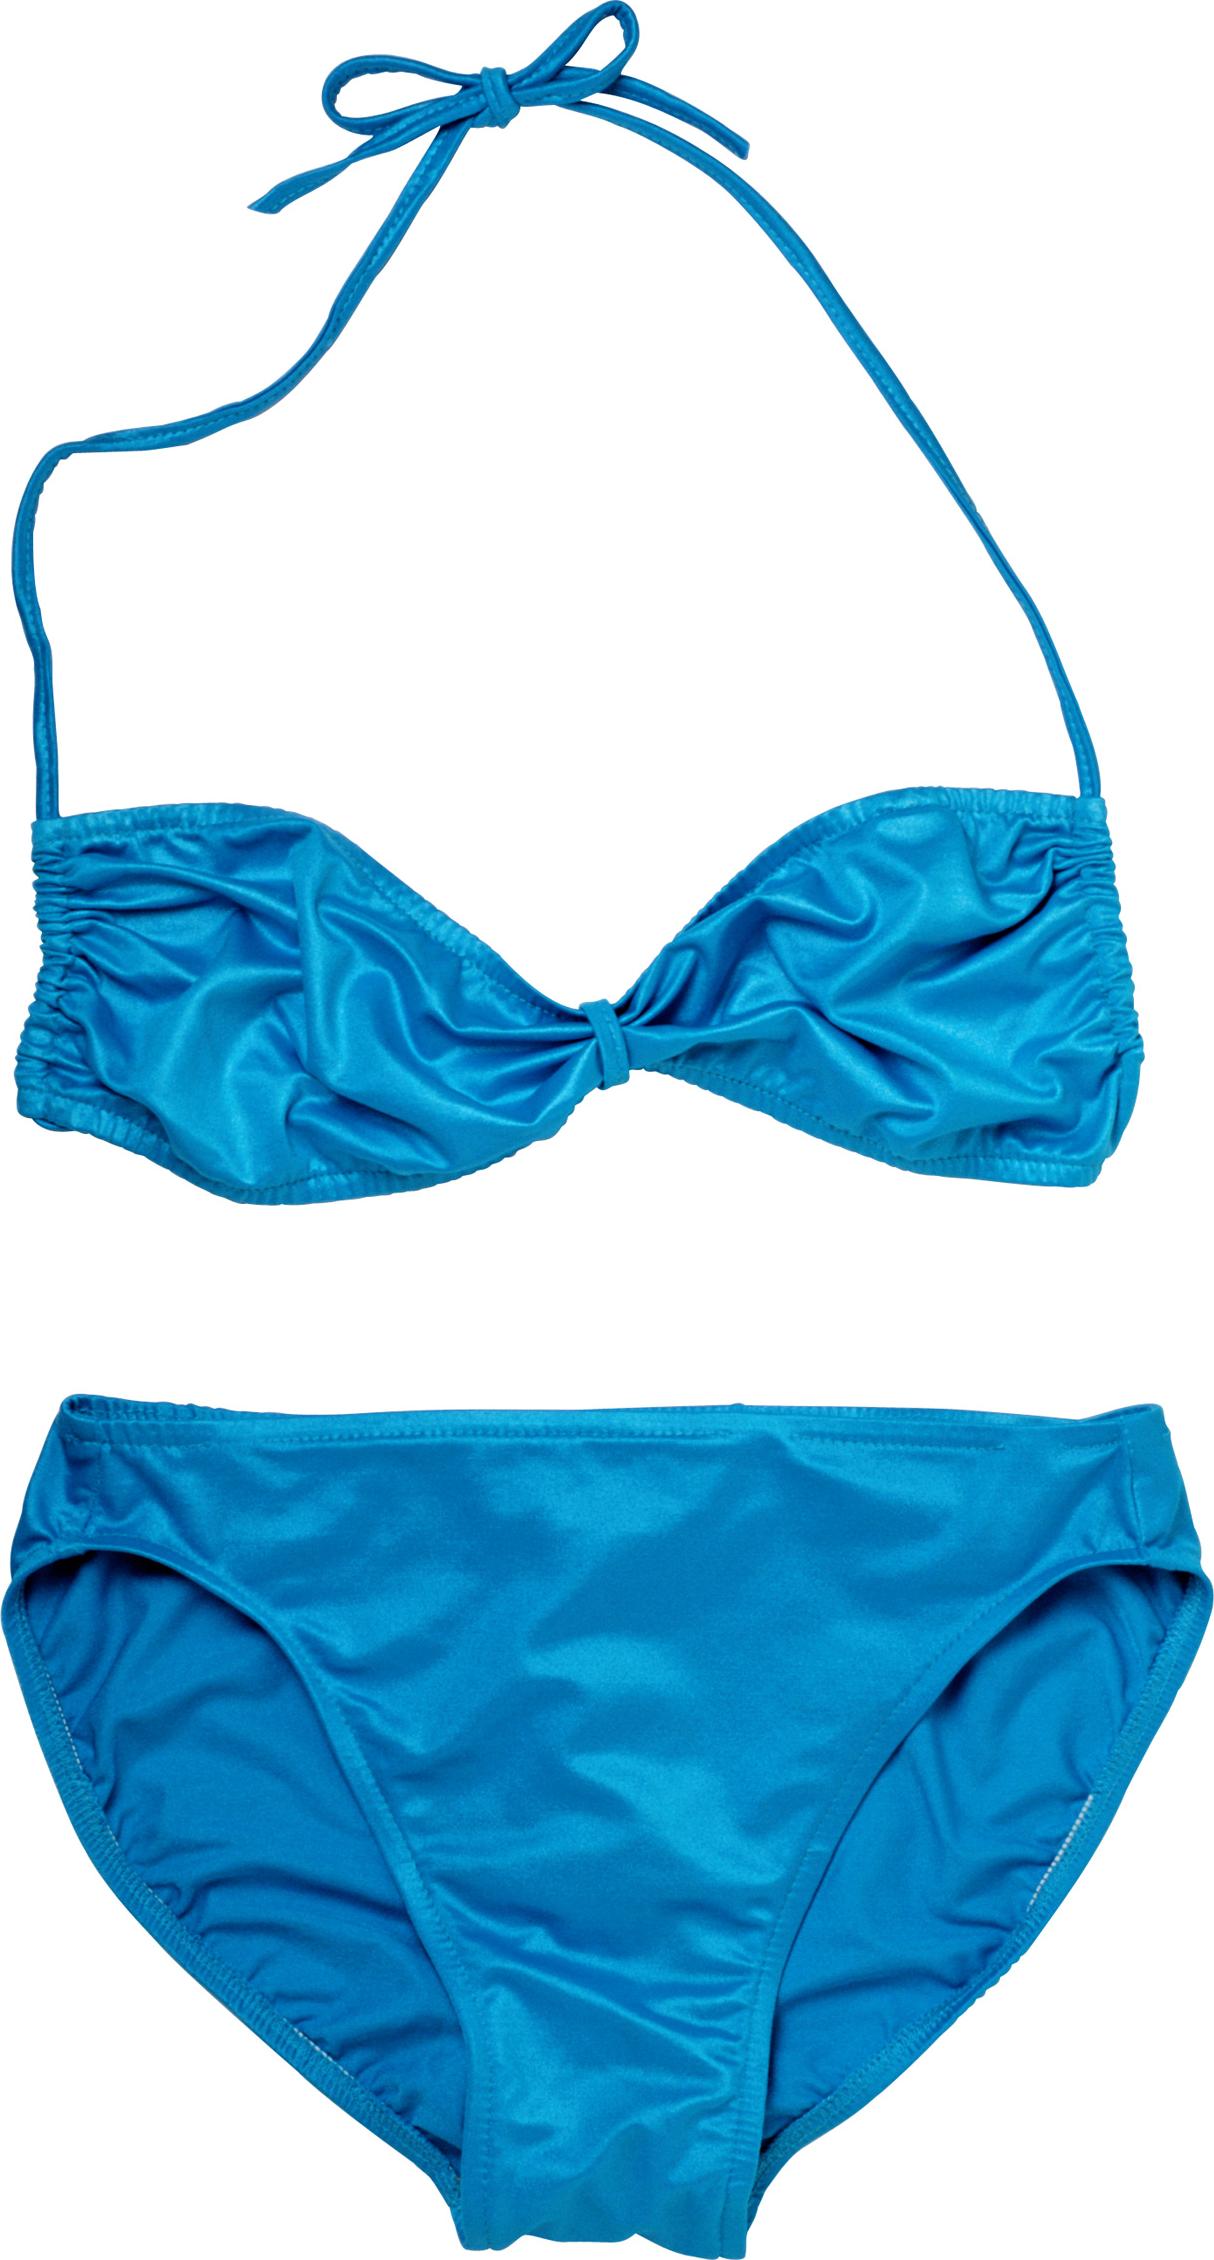 Bikini PNG Image SVG Clip arts